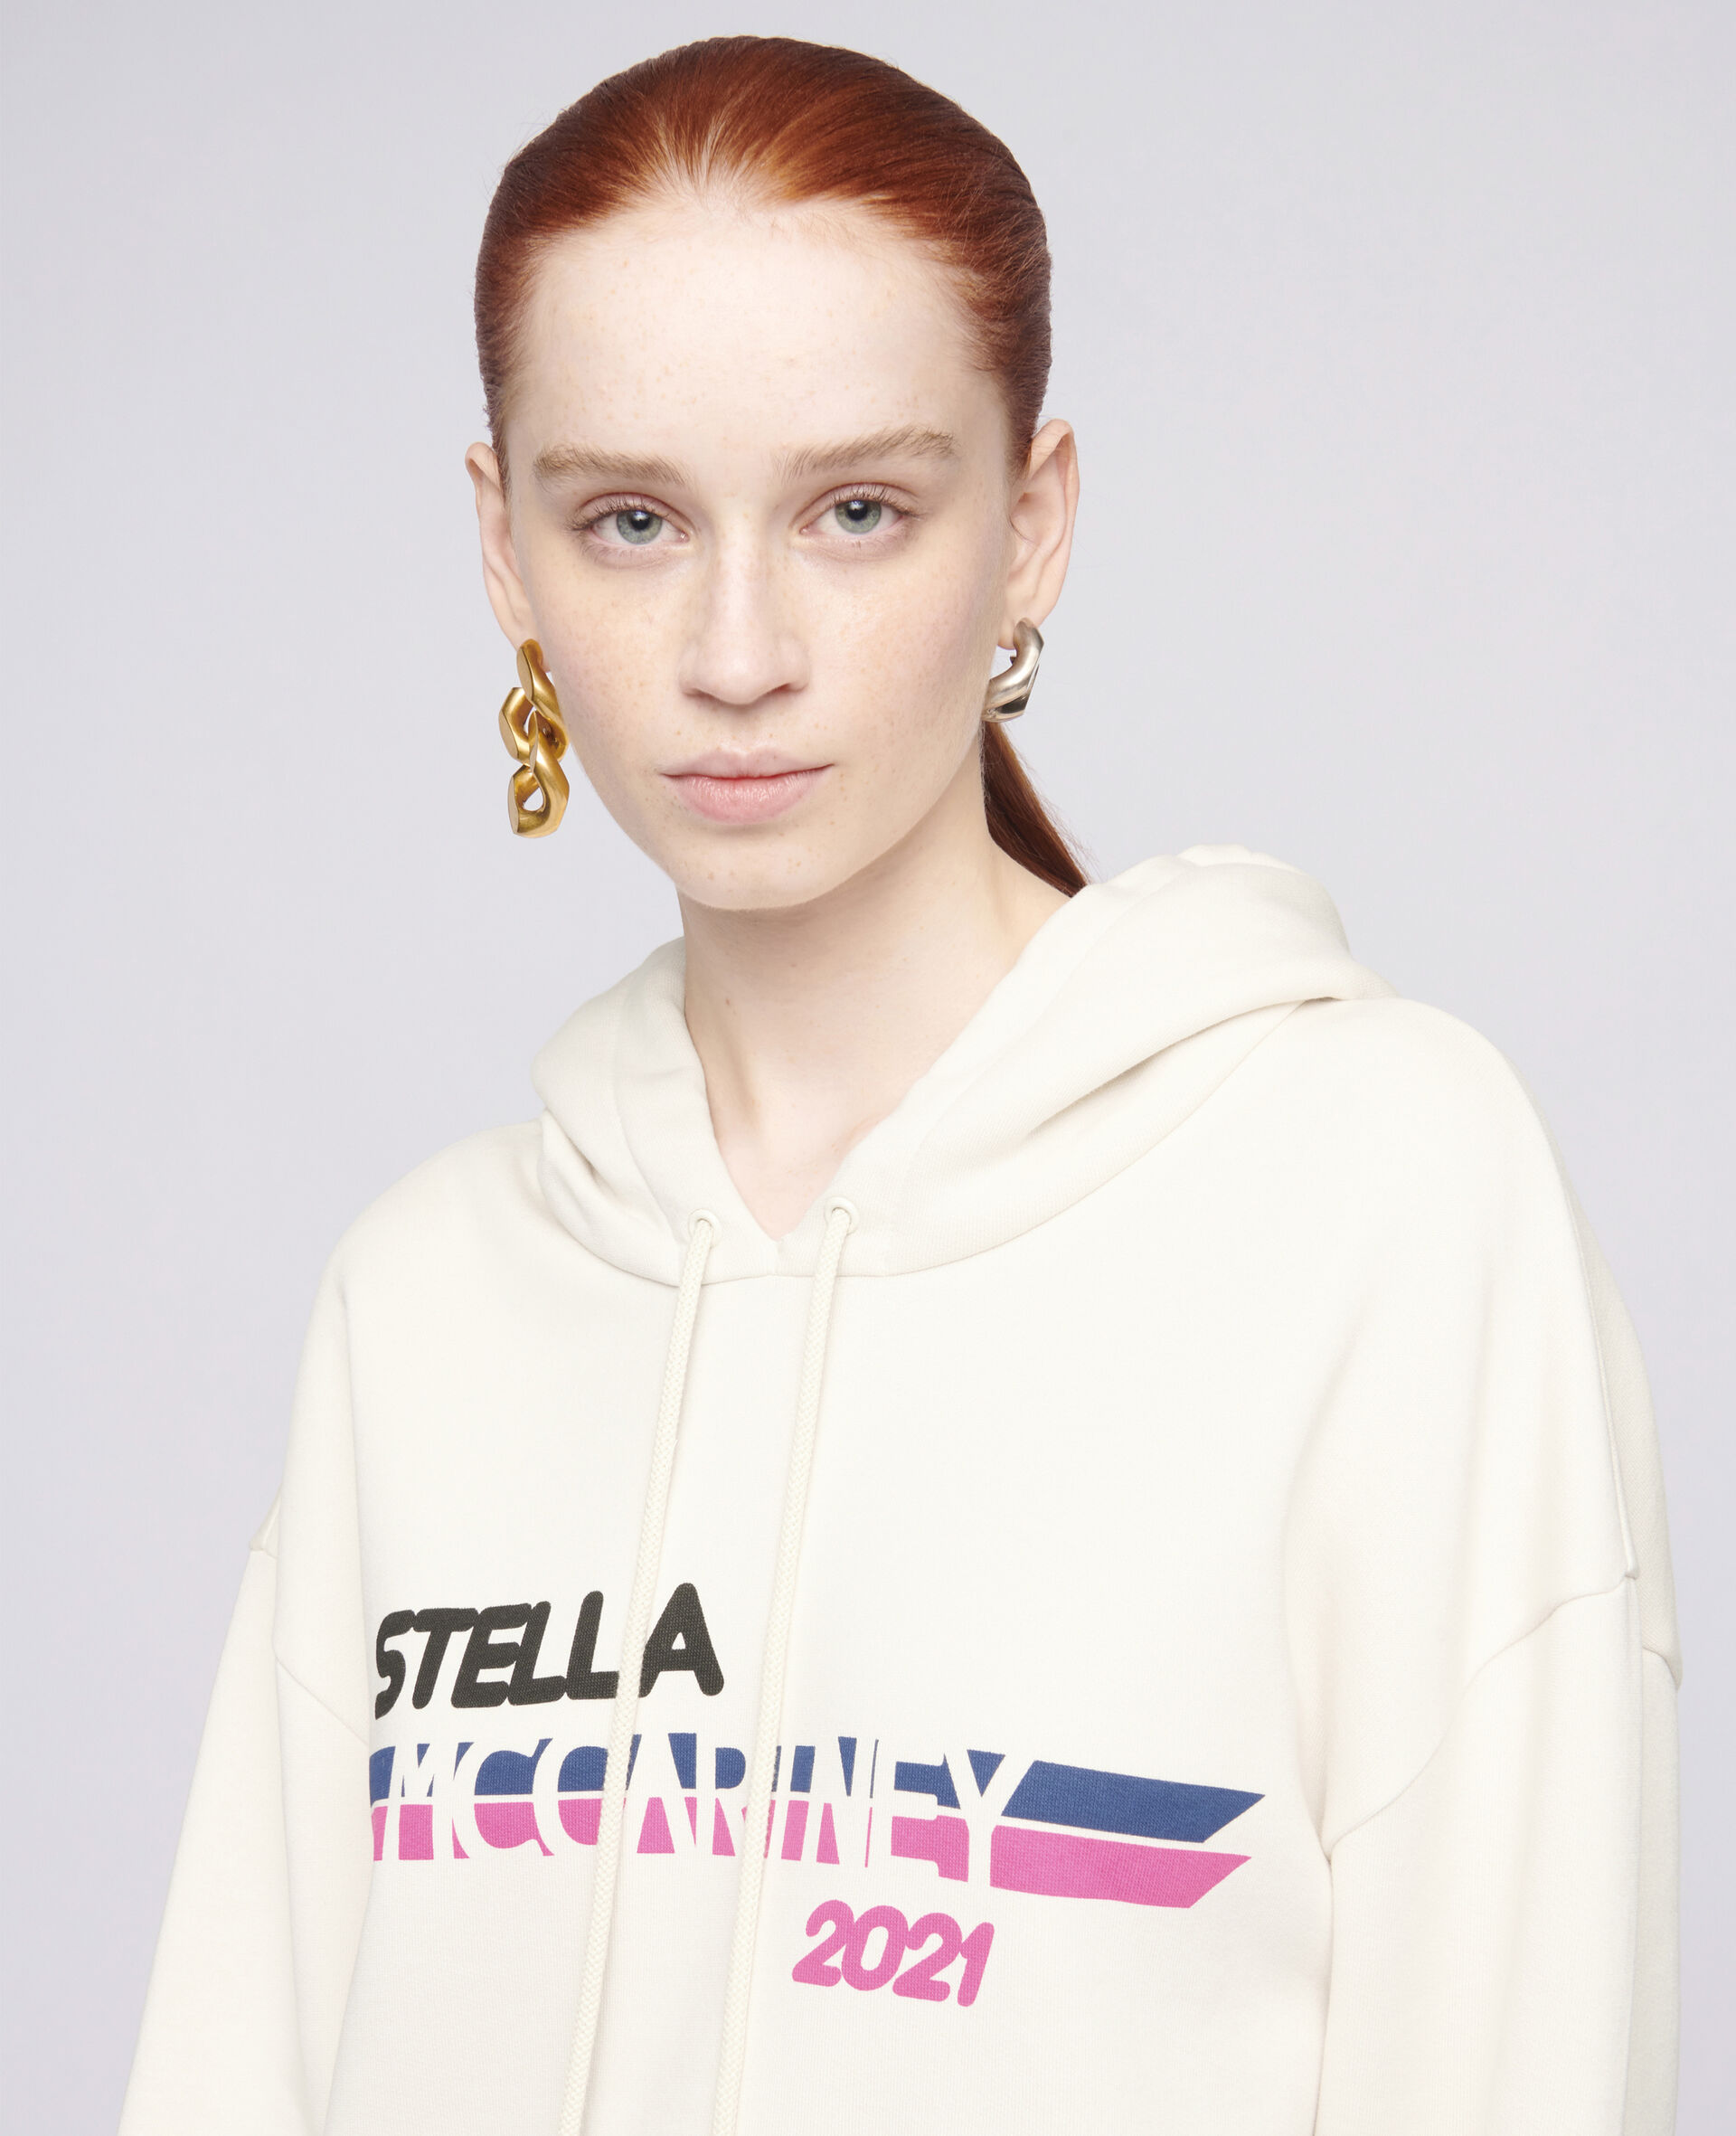 Sweat-shirt à capuche à logo Stella McCartney2021-Blanc-large image number 3